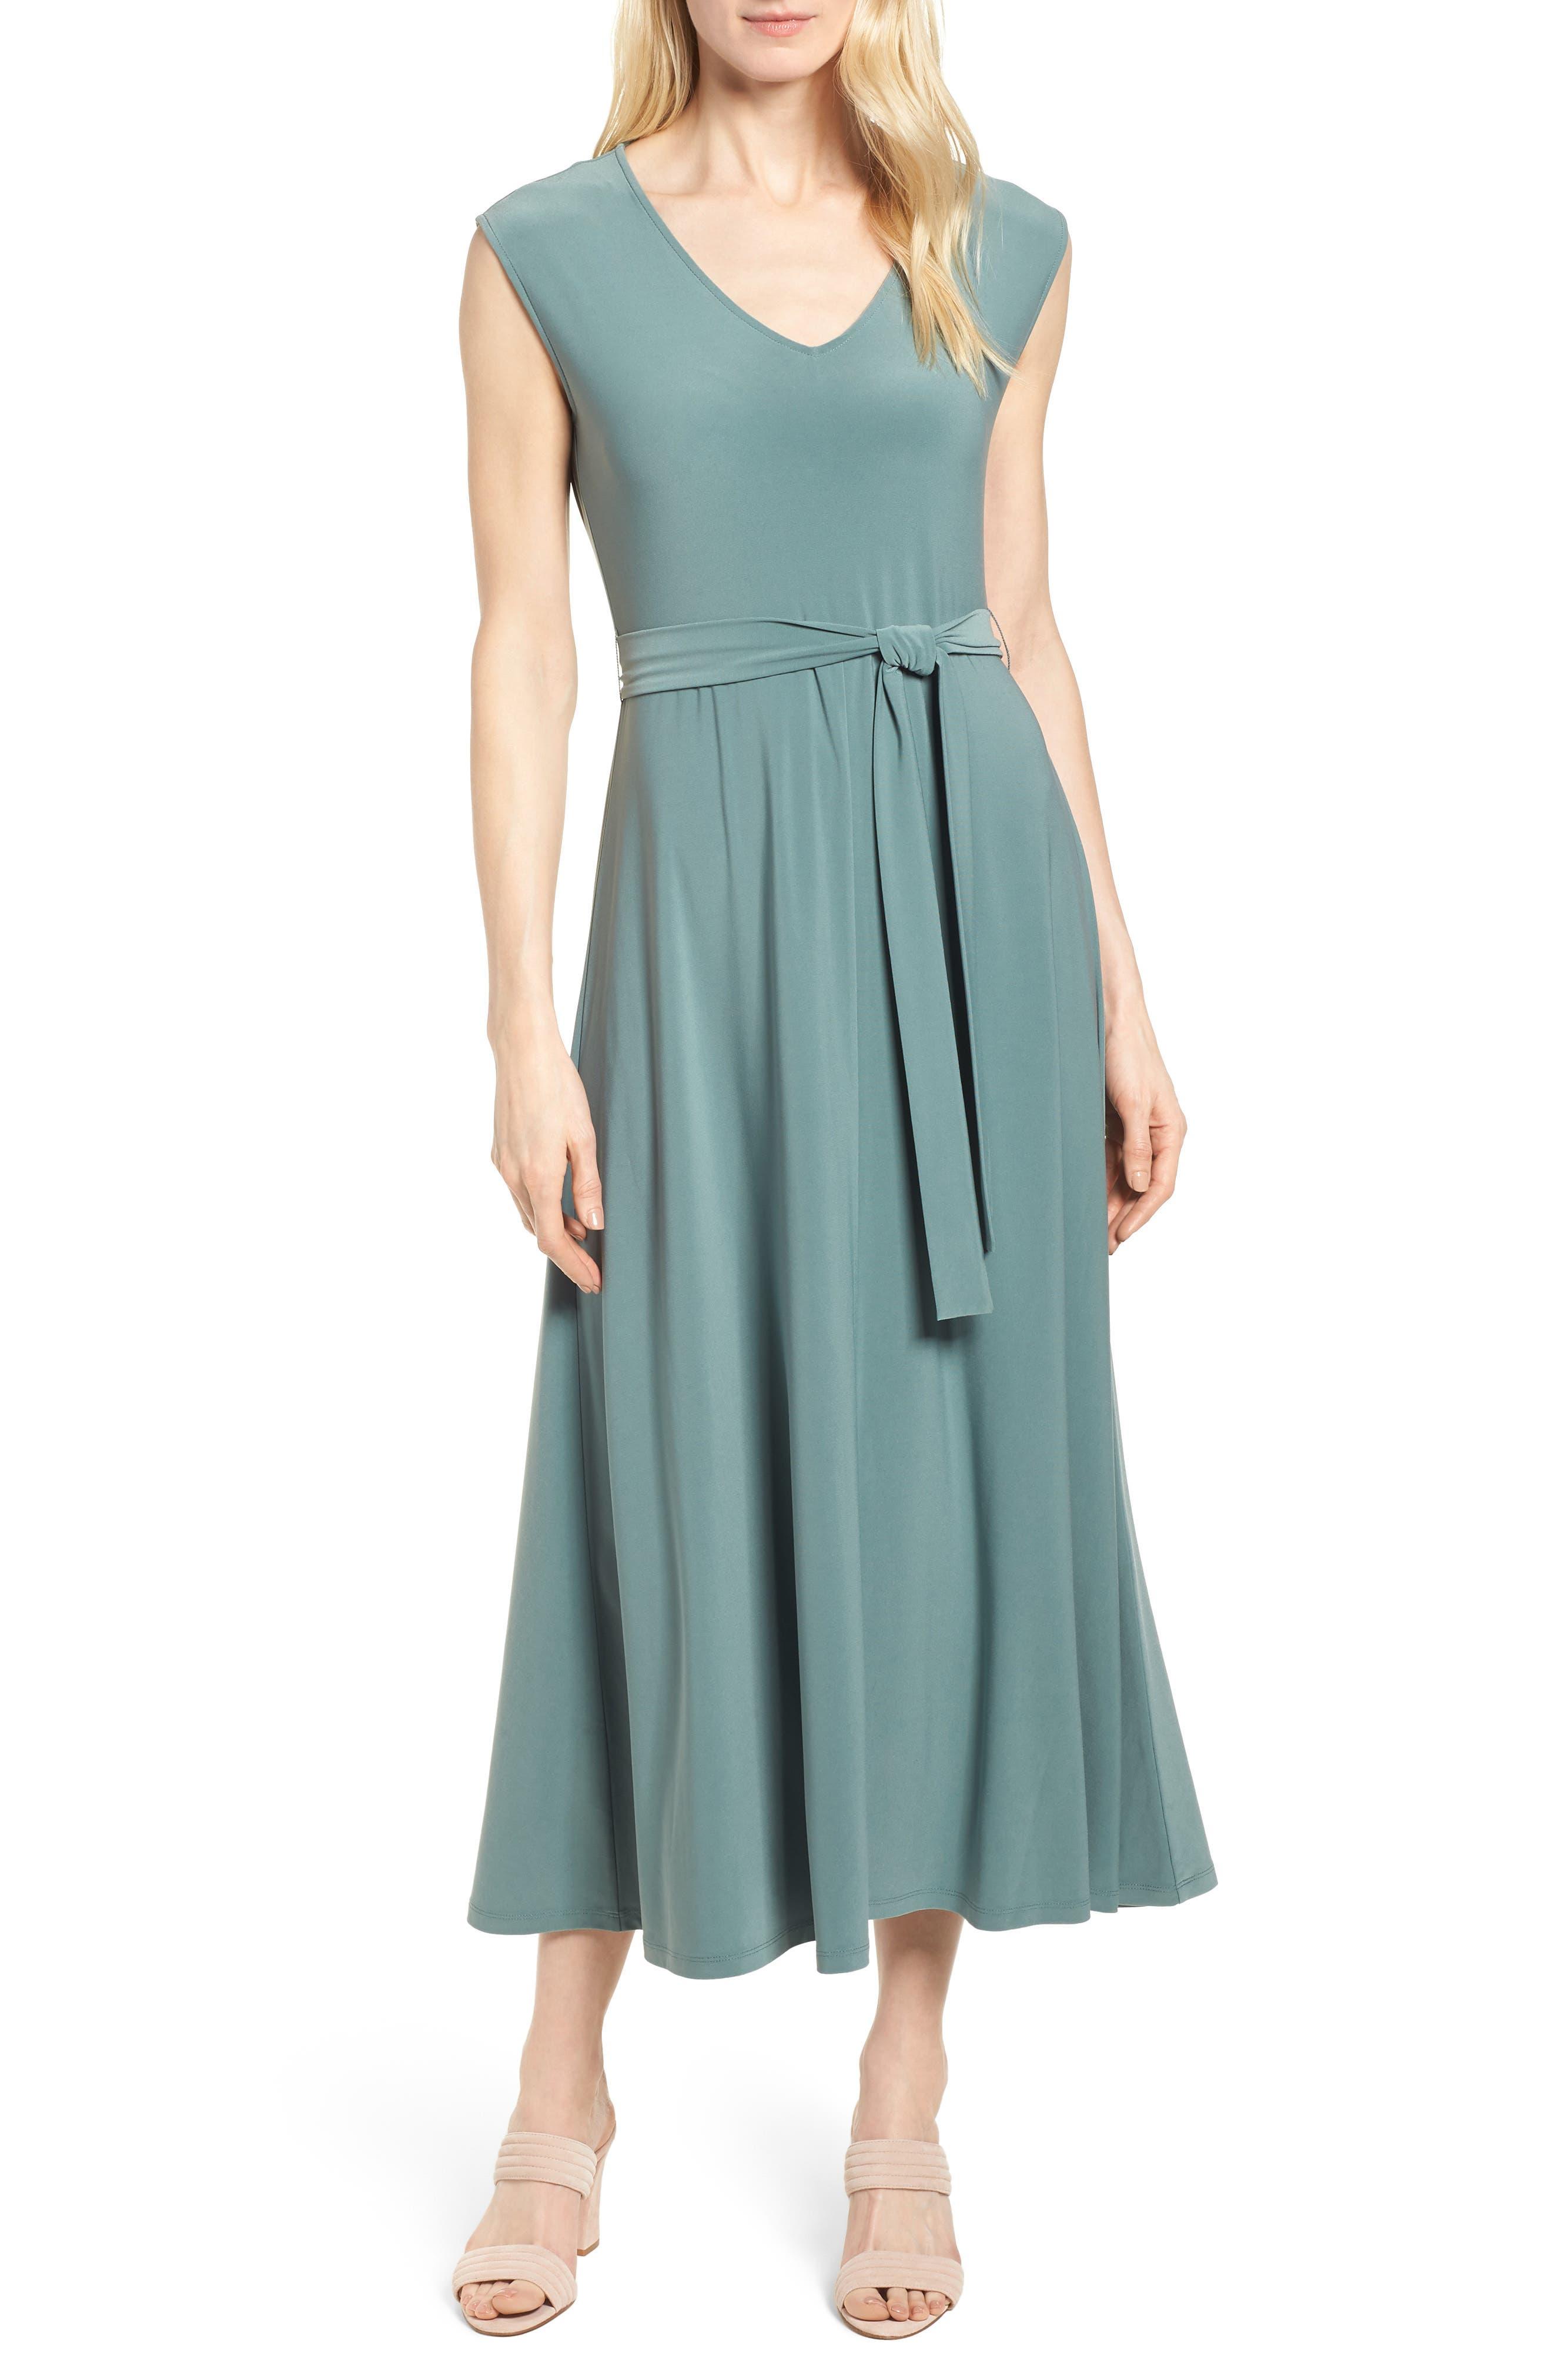 Tie Waist Maxi Dress,                         Main,                         color, 738-Tropic Moss